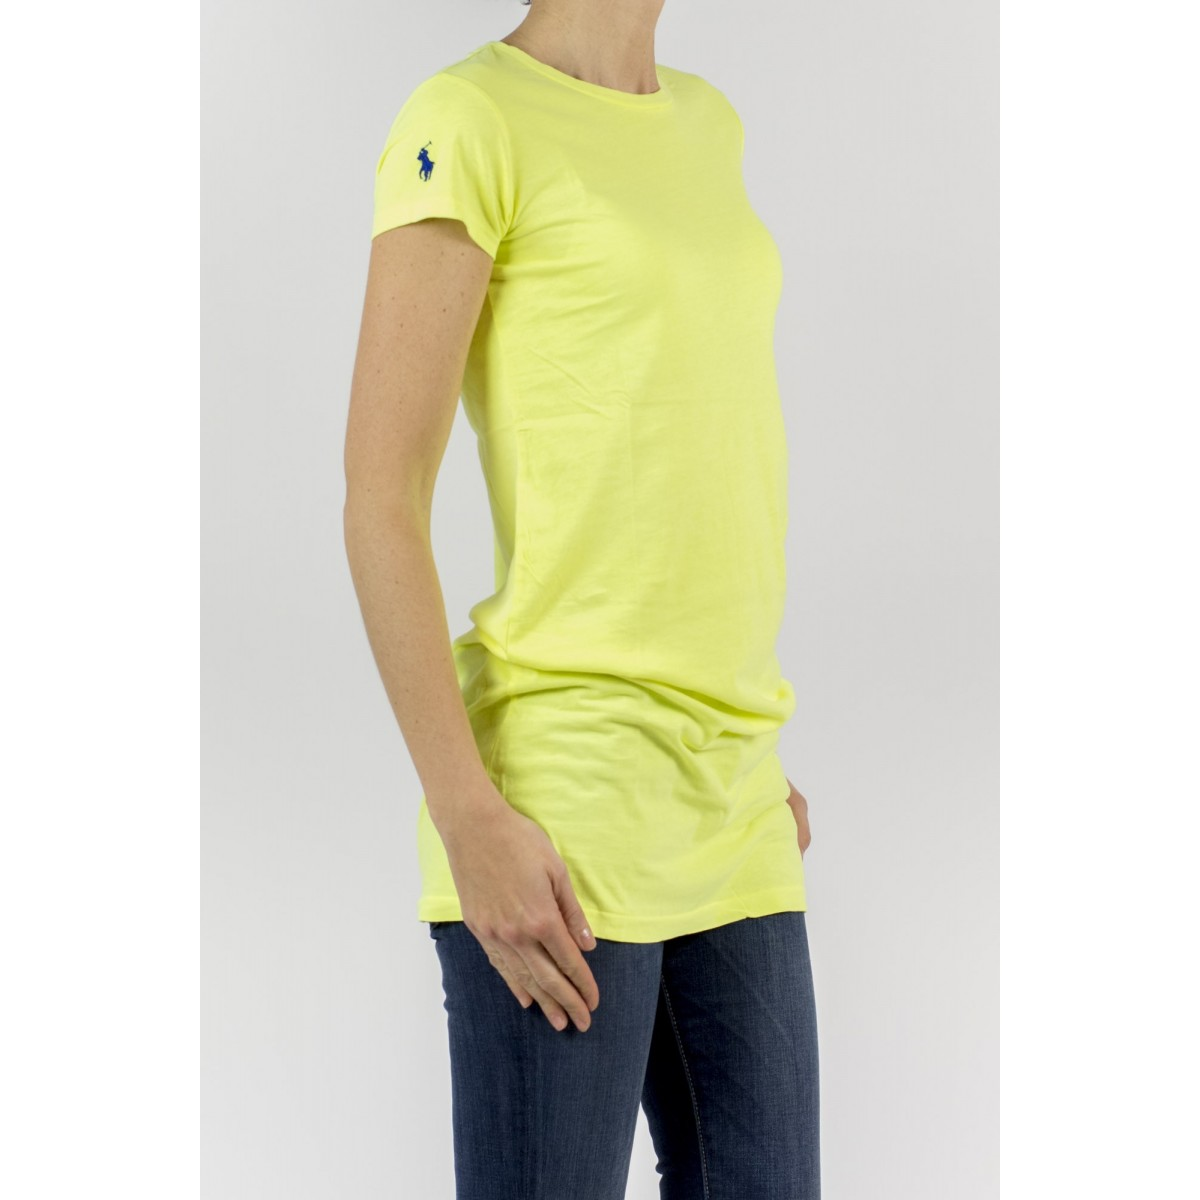 T-shirt donna Ralph lauren - V38iccrtc8410 B7418 - giallo